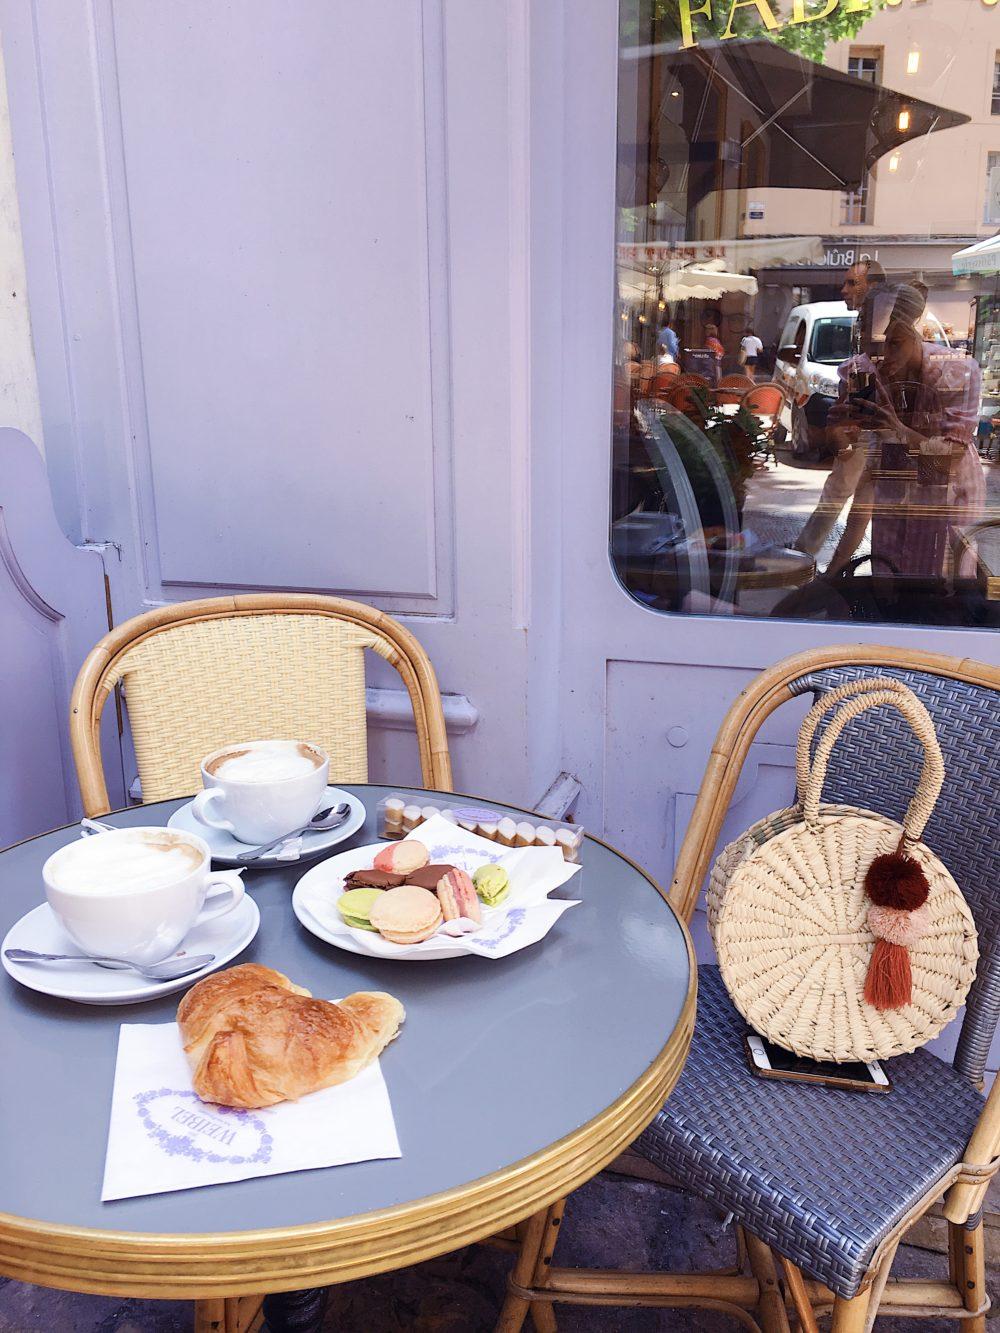 Aix-en-Provence-France-patisserie-1-e1530894765906.jpg